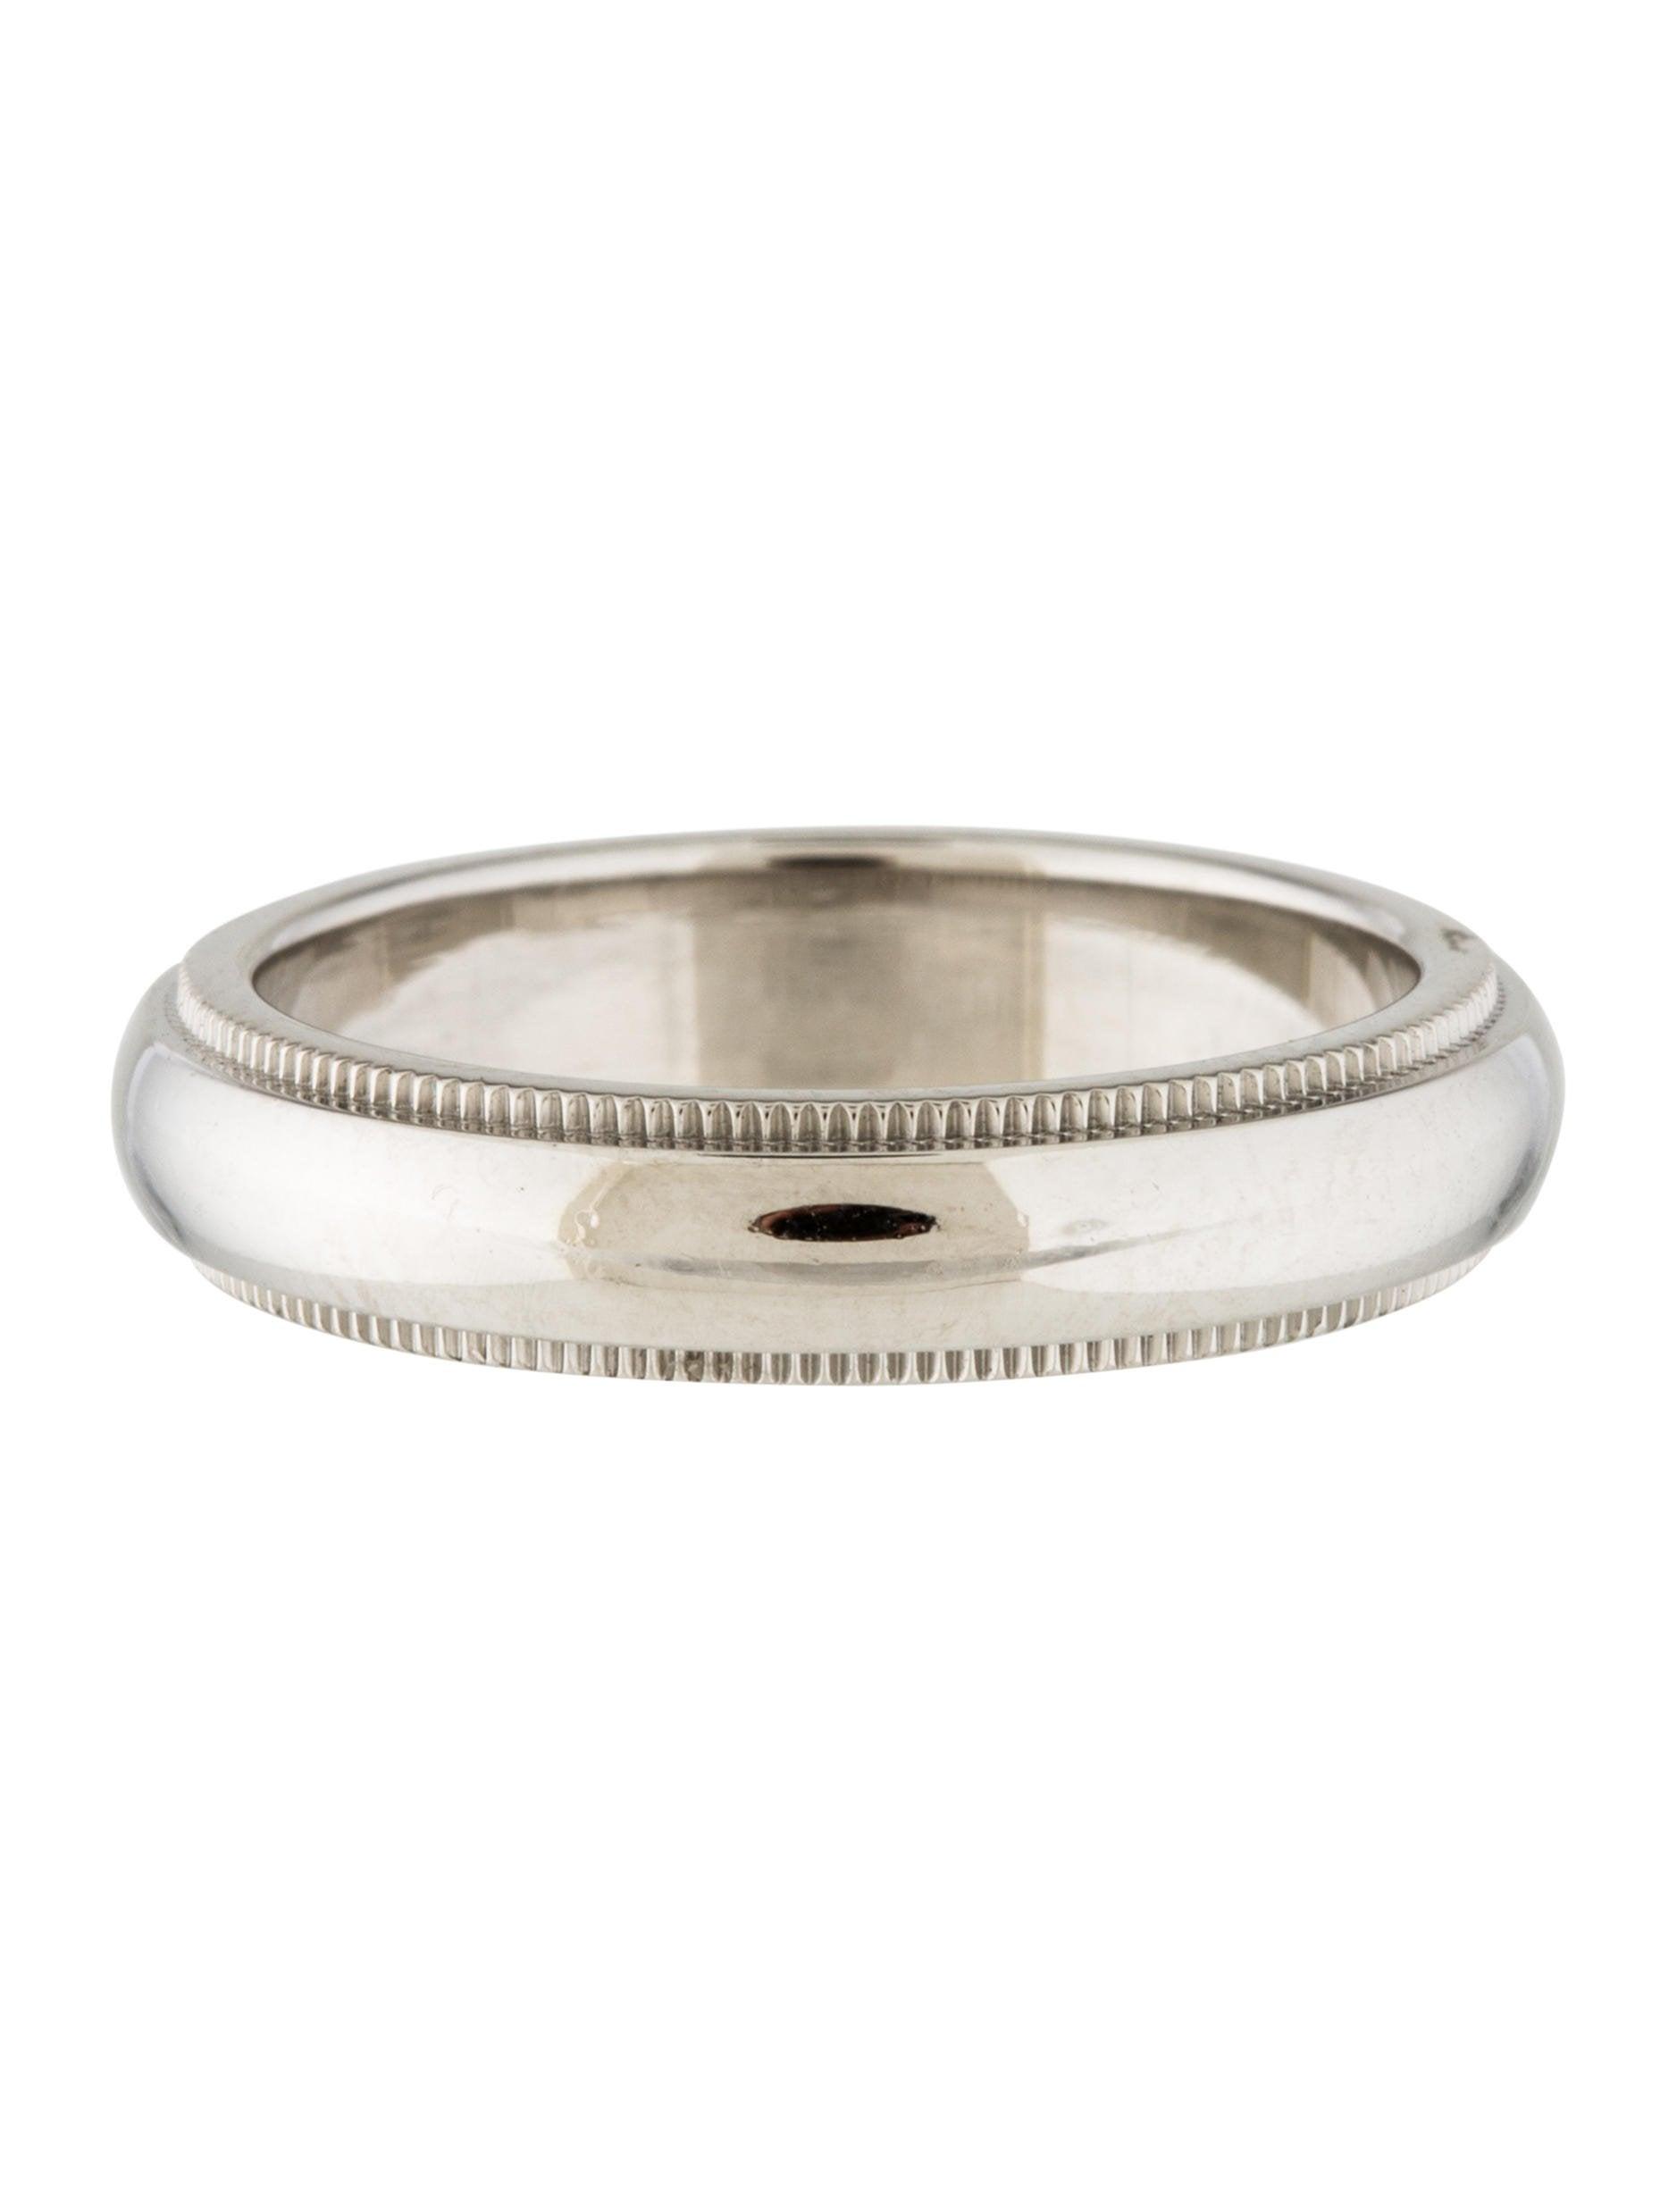 Tiffany Co Milgrain Wedding Band Ring Rings TIF62802 The